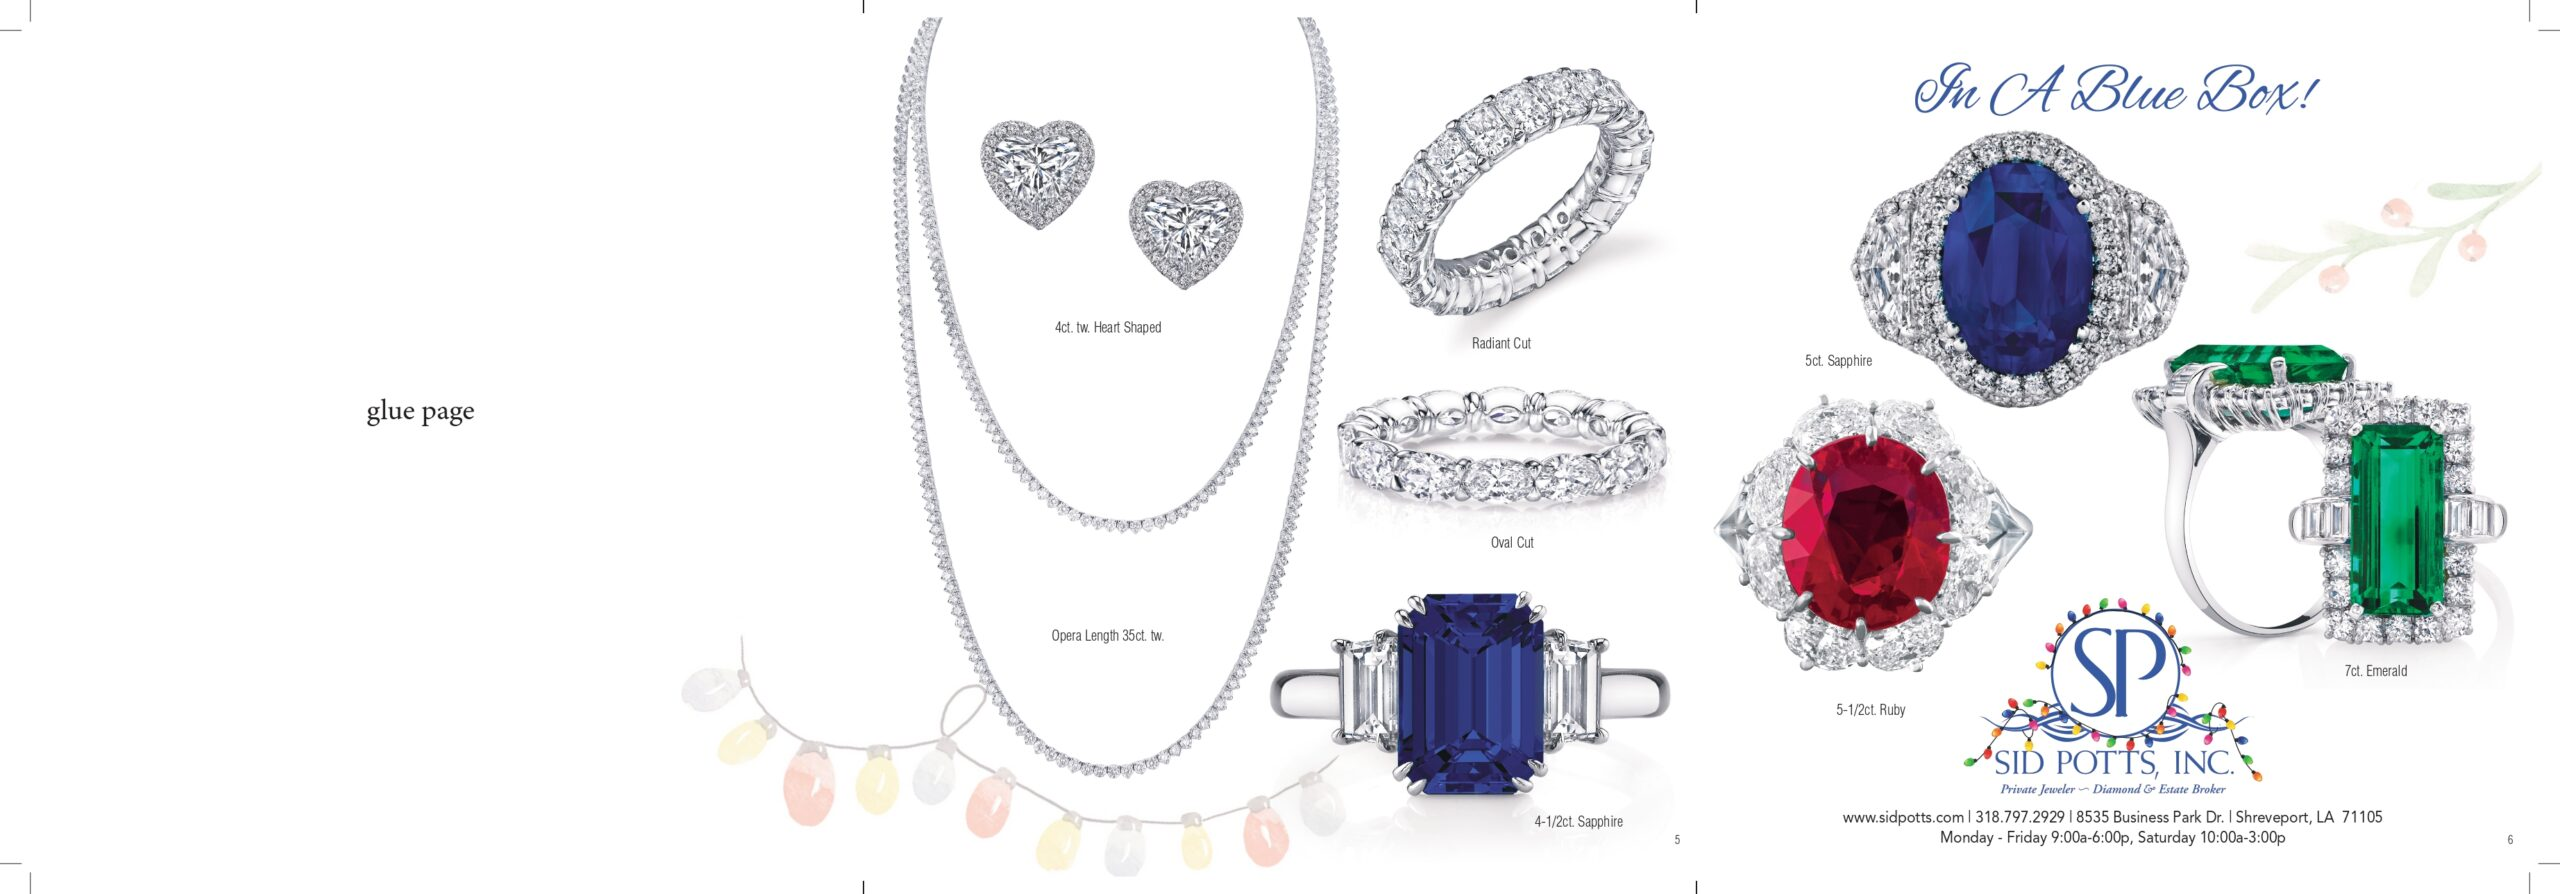 POTTS Big Diamond mailer SPREAD page 4